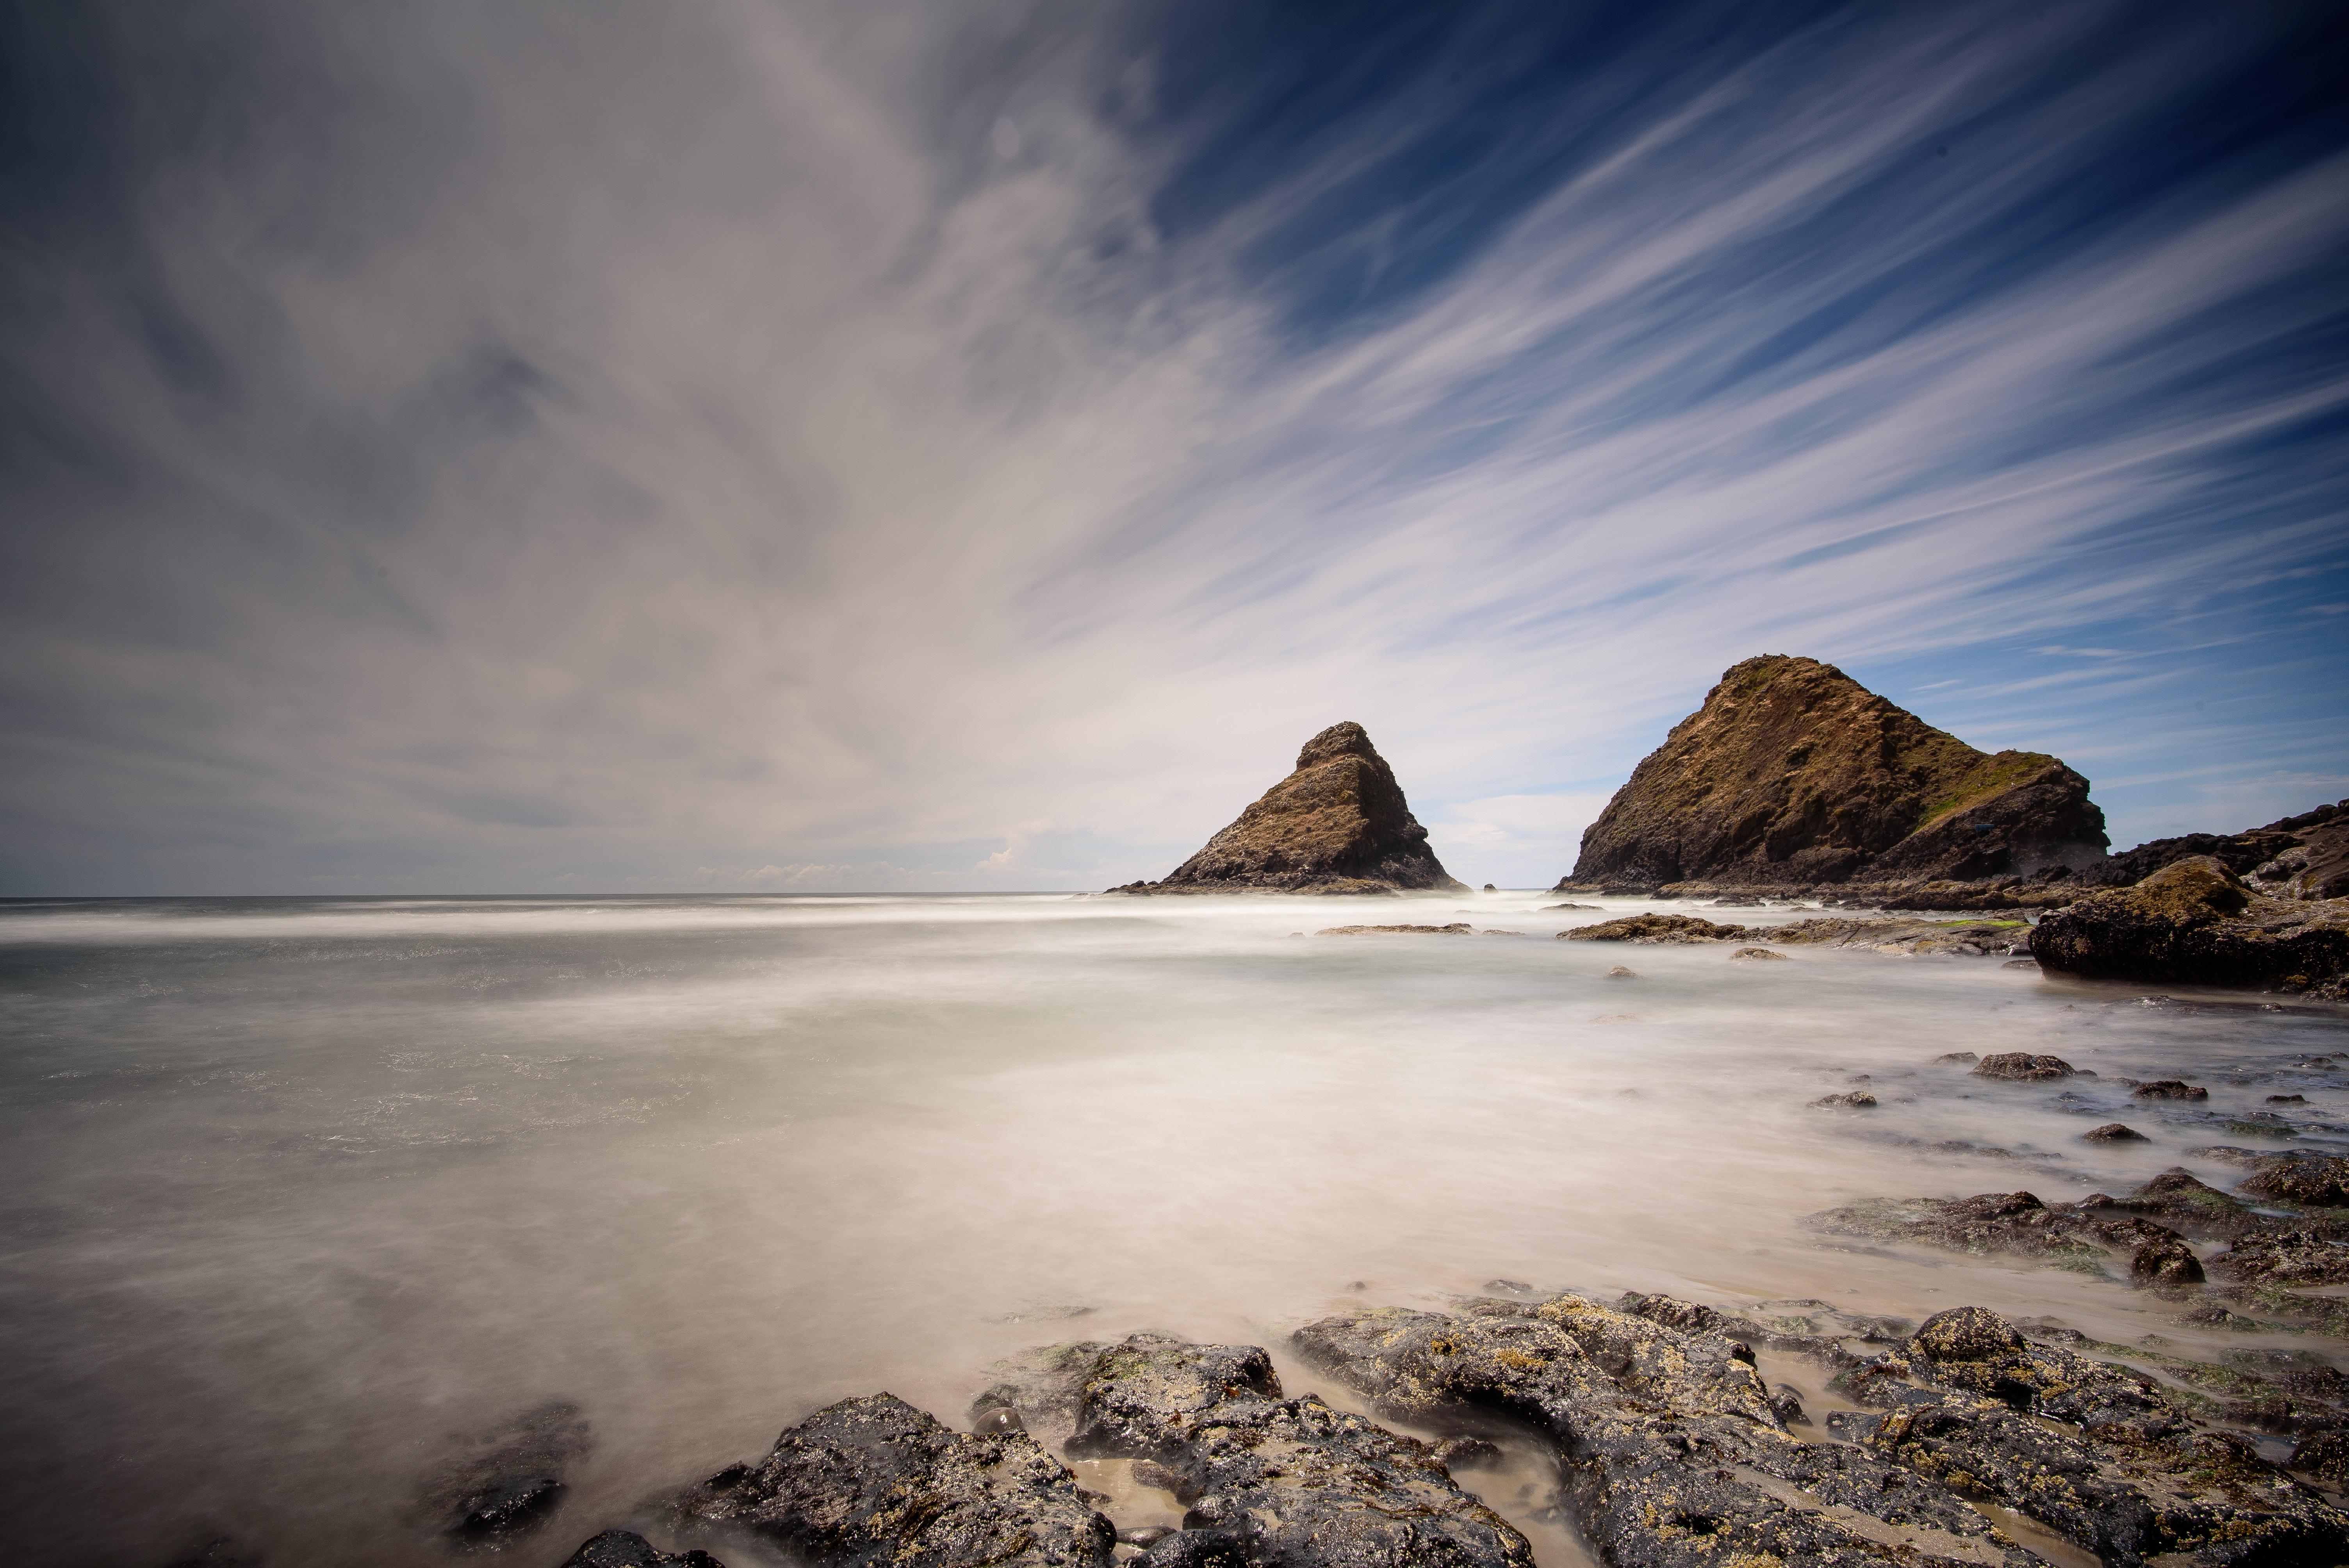 Long exposure photo of the rocky ocean shoreline at Heceta Beach